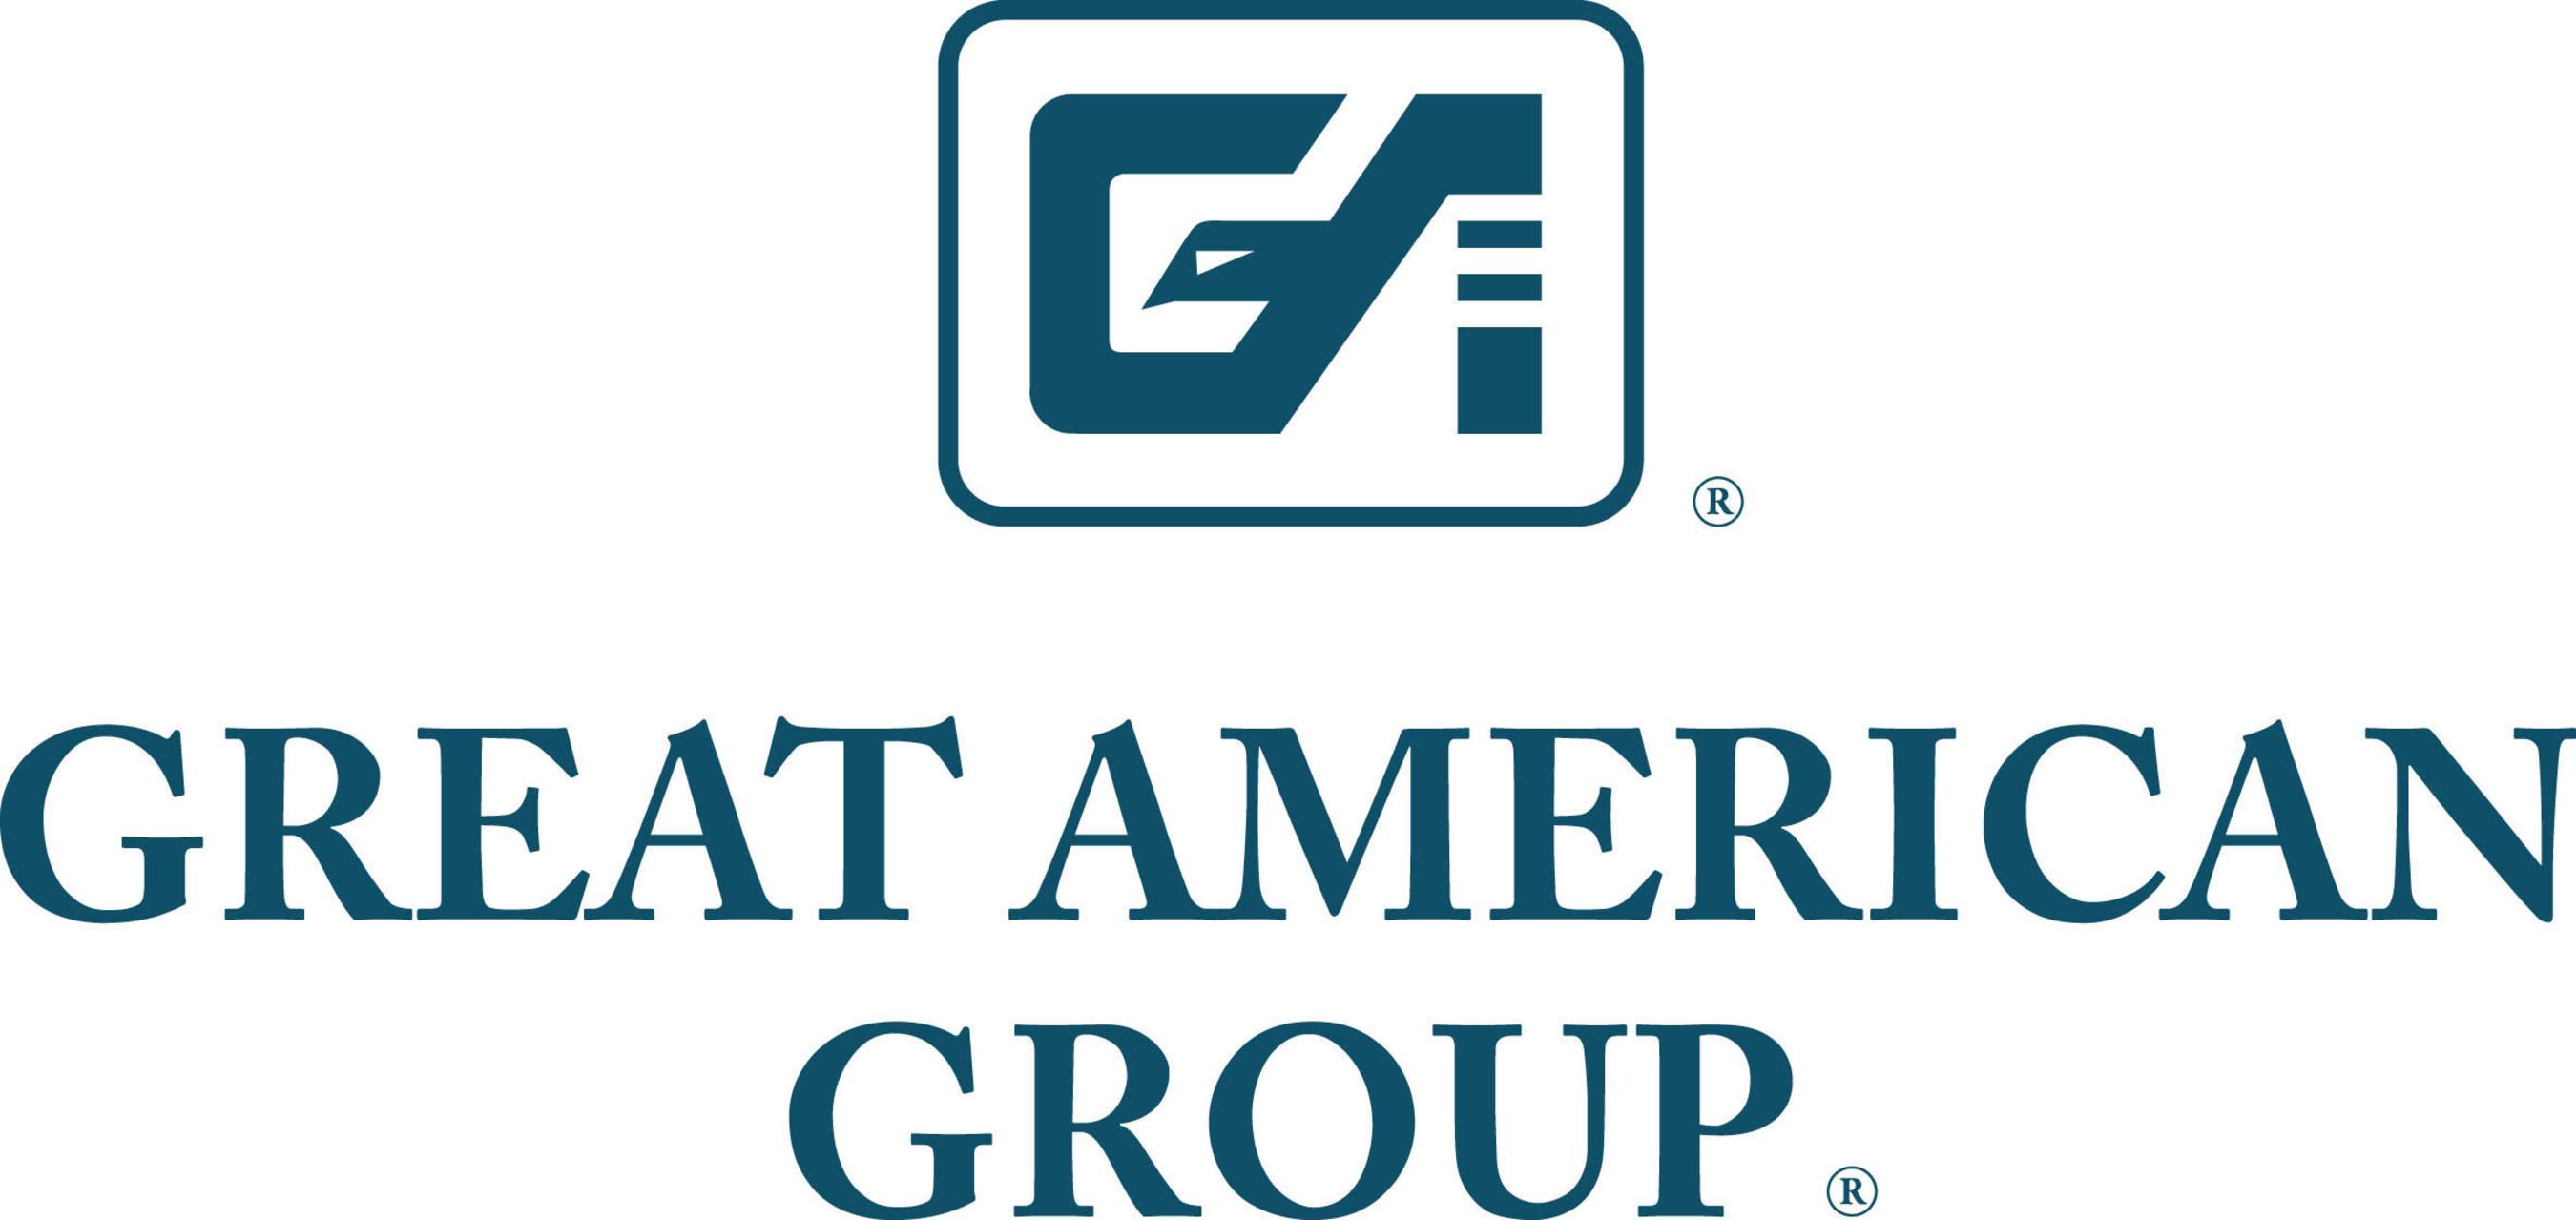 Great American Group logo